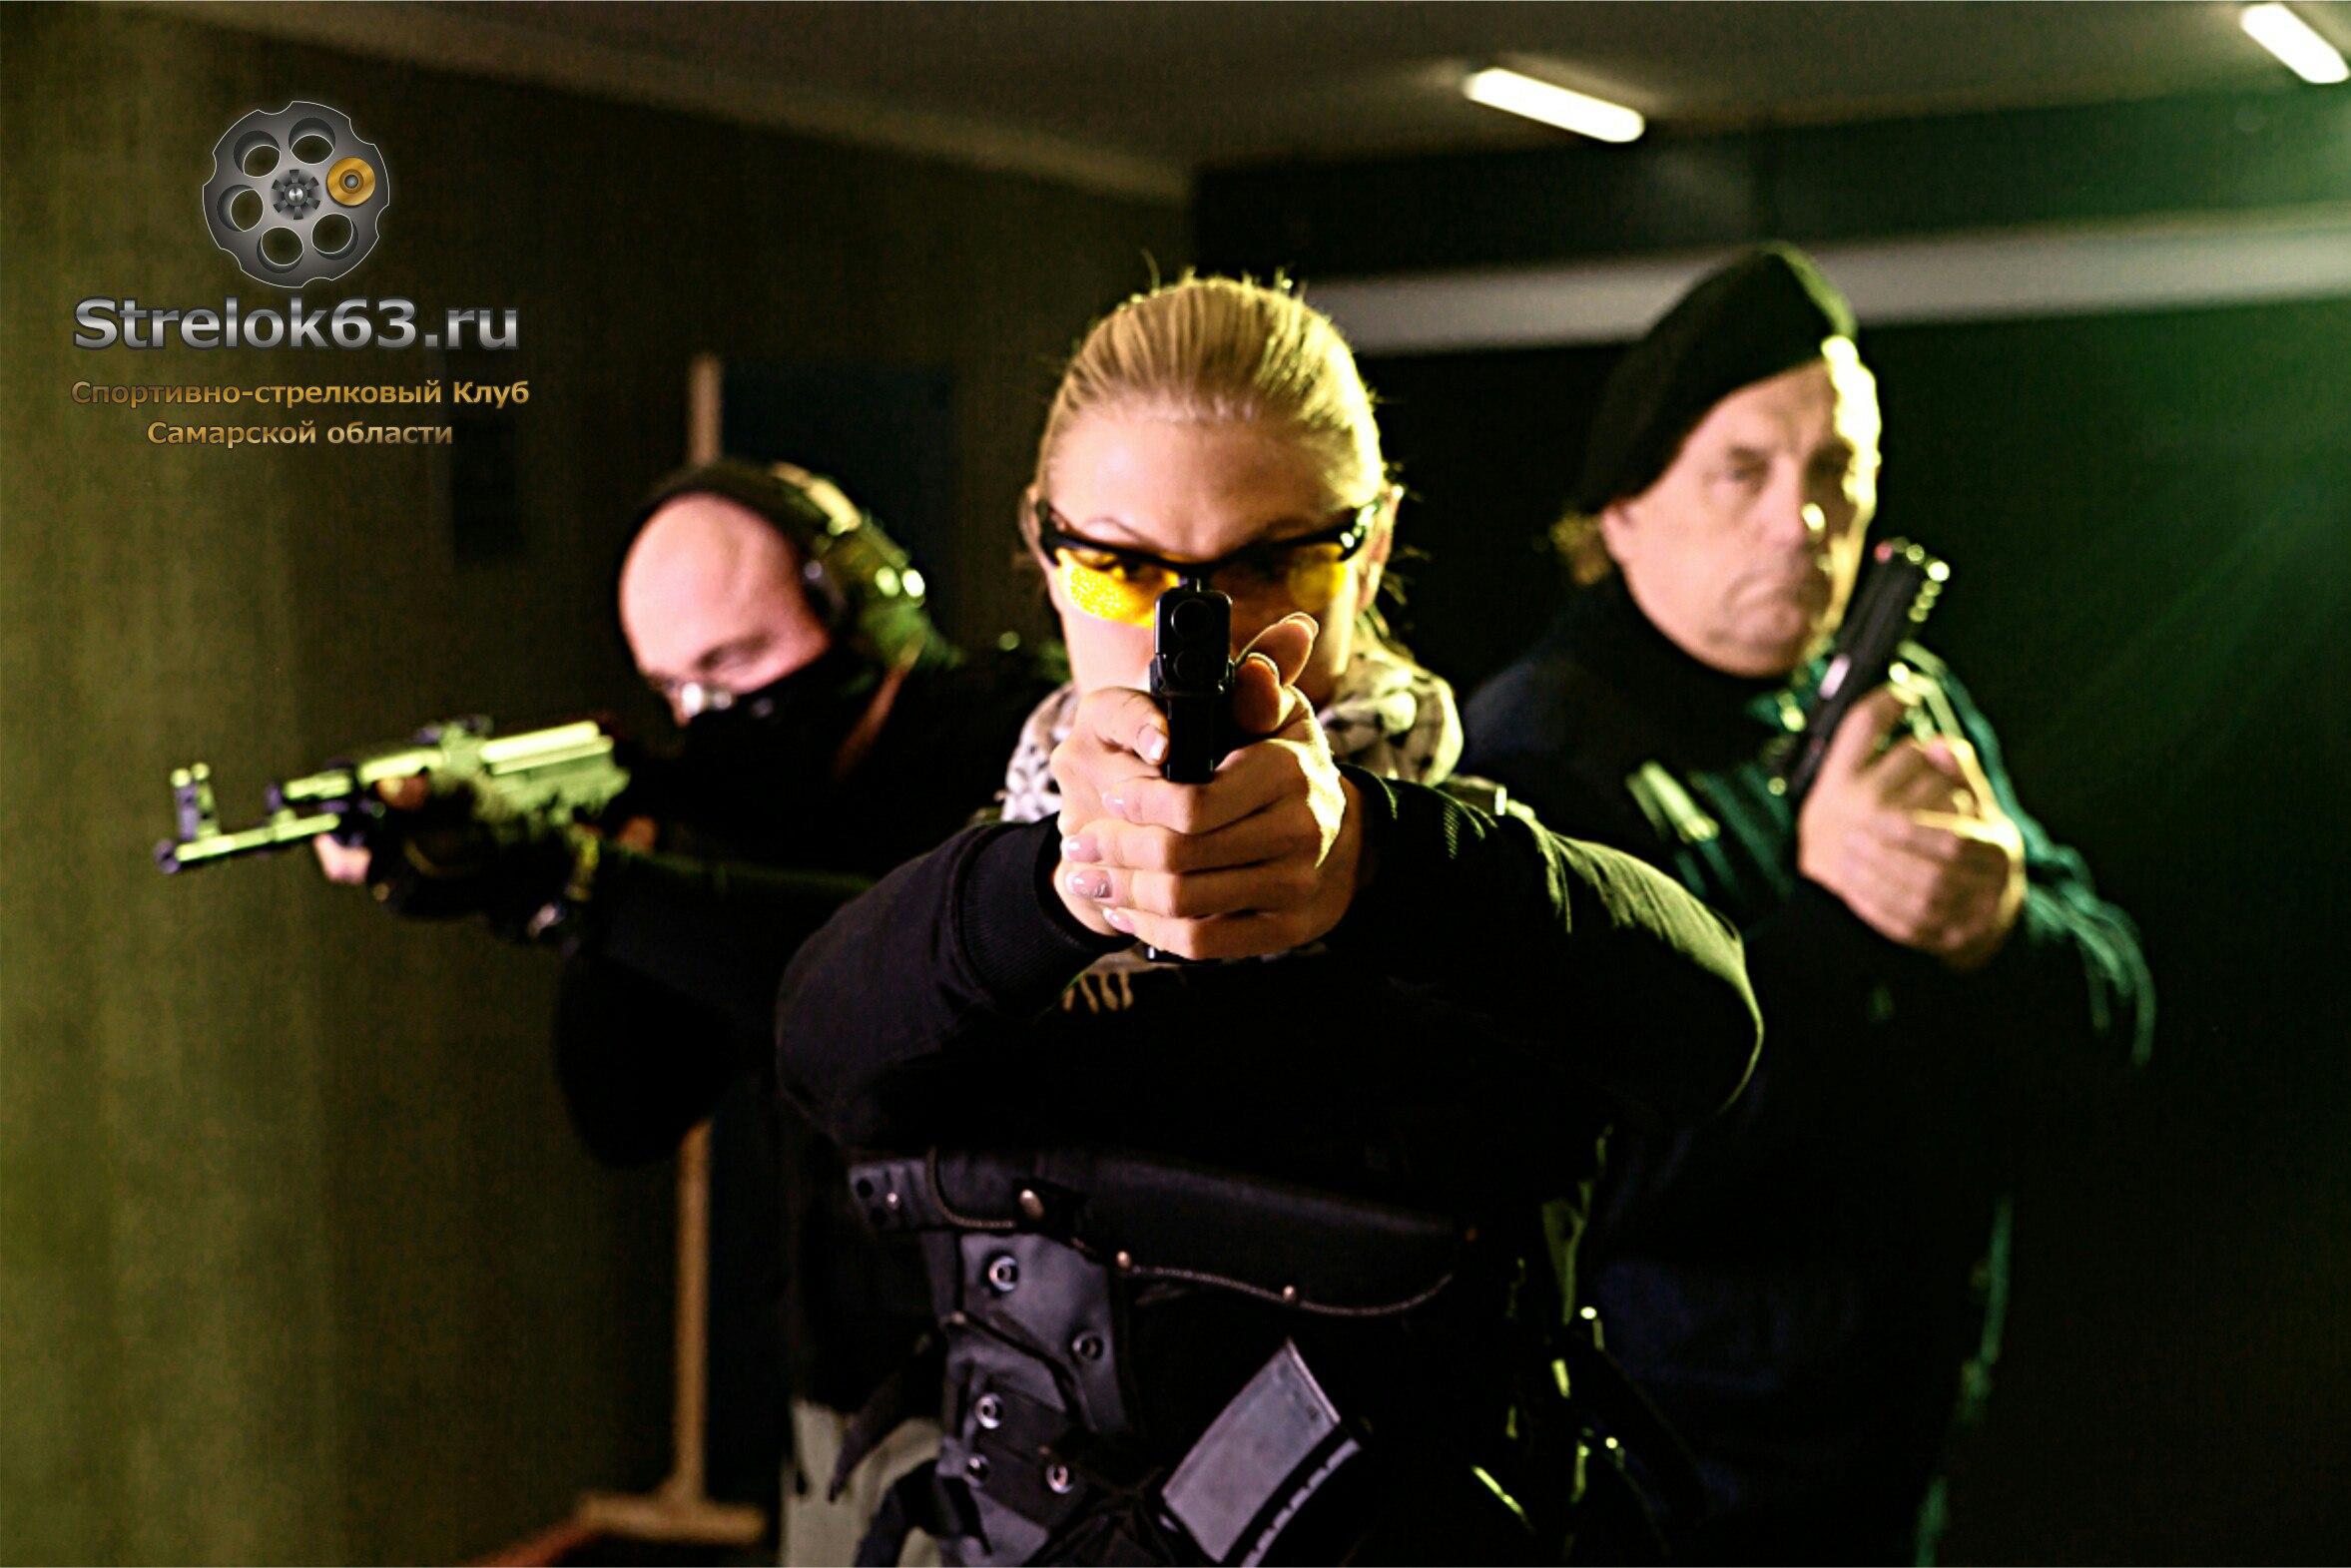 cAvjk7-UqSc